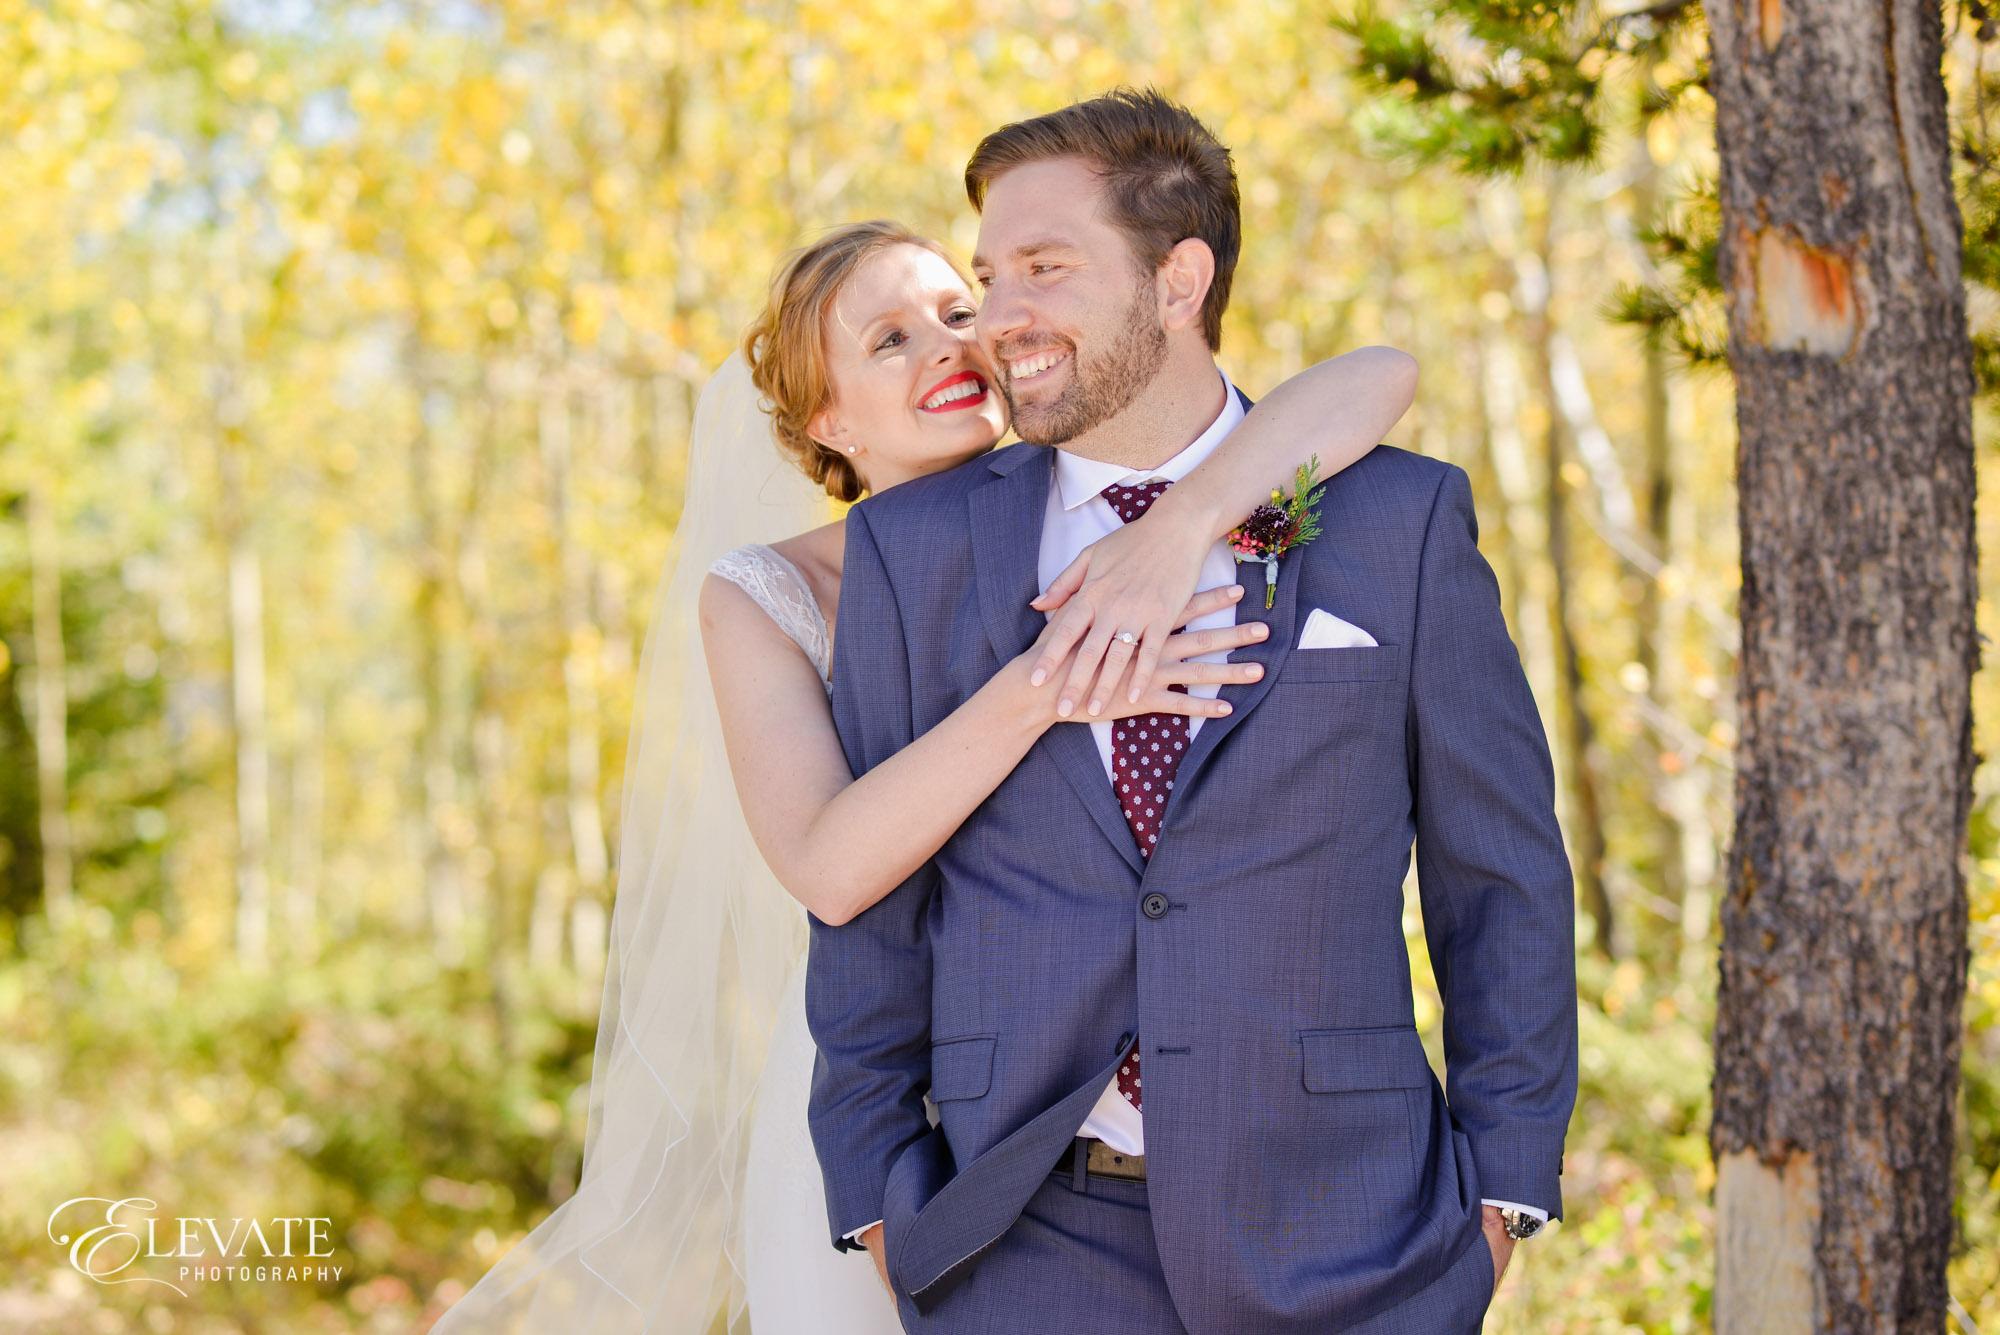 groom blue suit maroon tie bride red lipstick